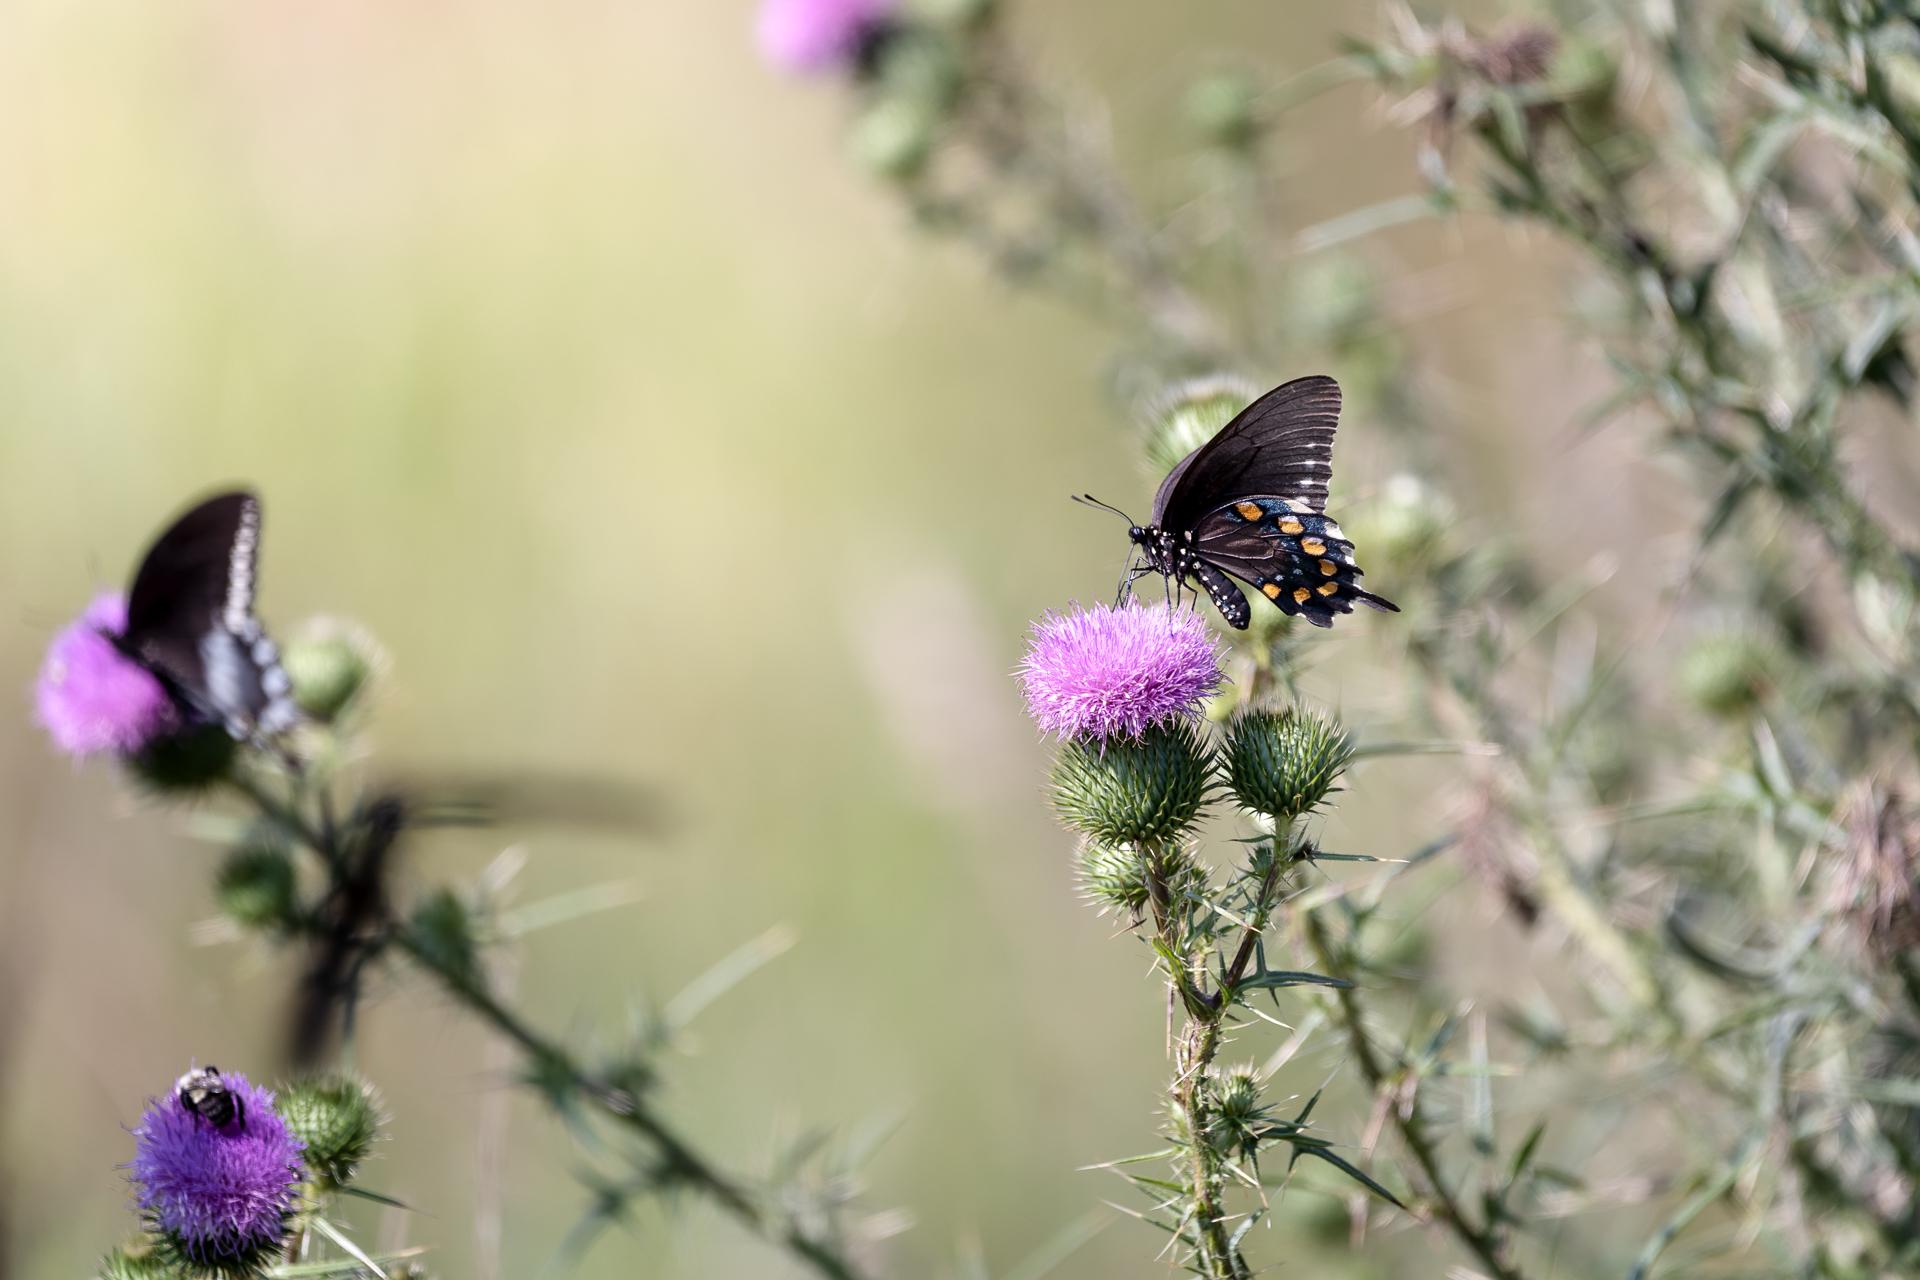 Butterflies-nature-Kathleen-Kathy-Roberts-Asheville-NC-Photographer-7.jpg